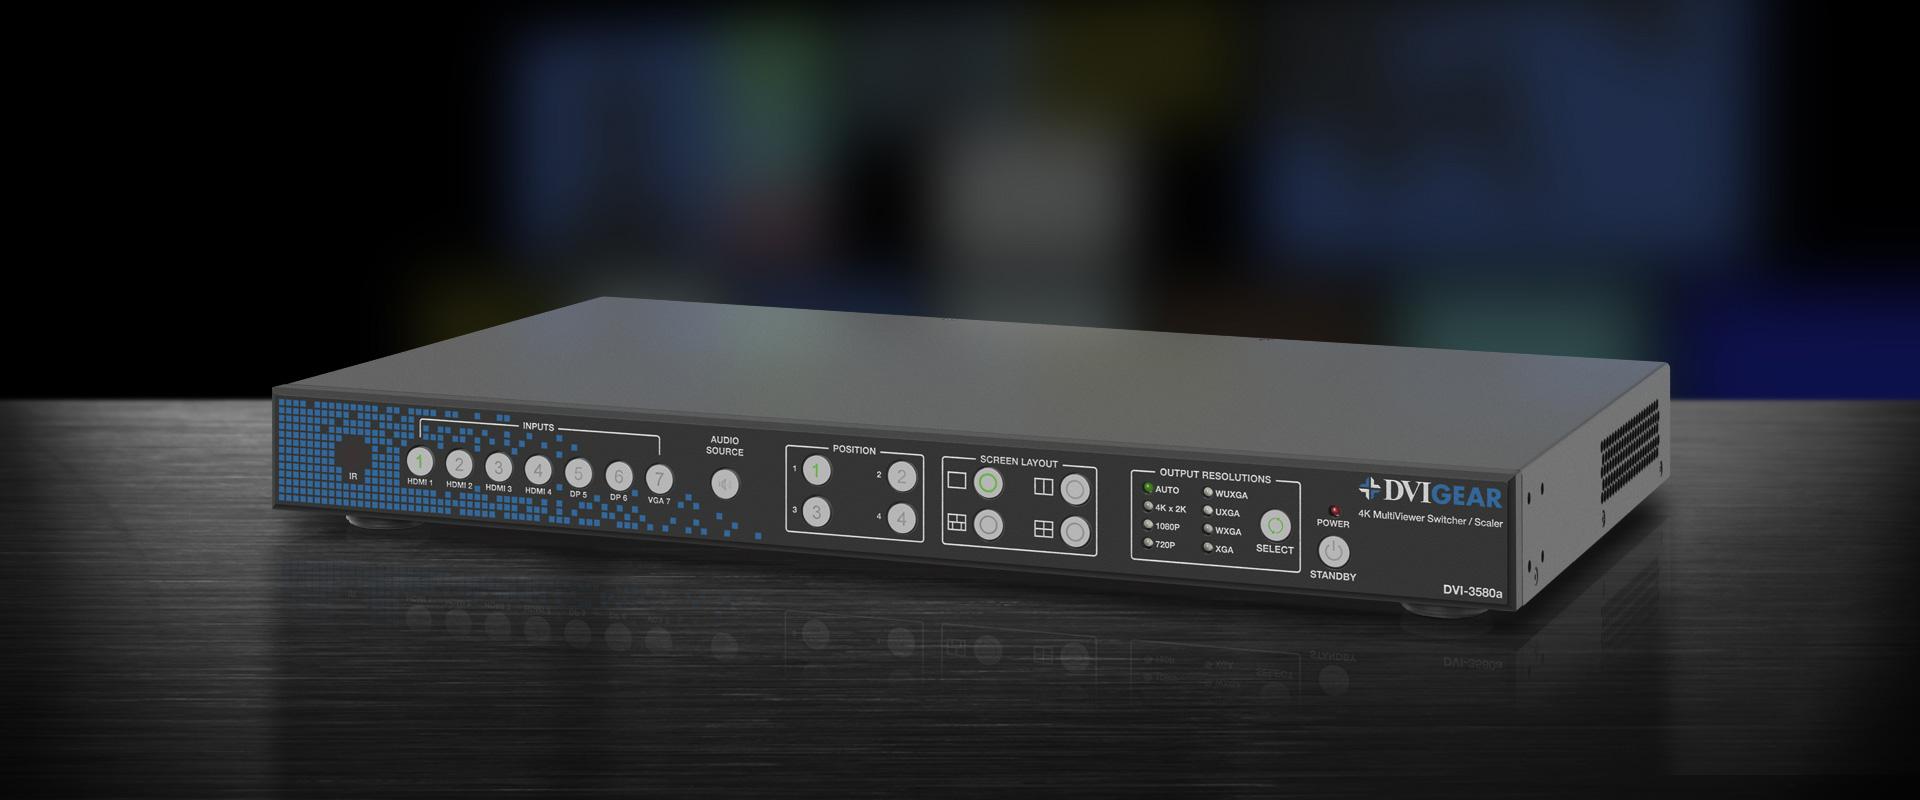 DVI-3580a 4K MultiViewer Switcher / Scaler